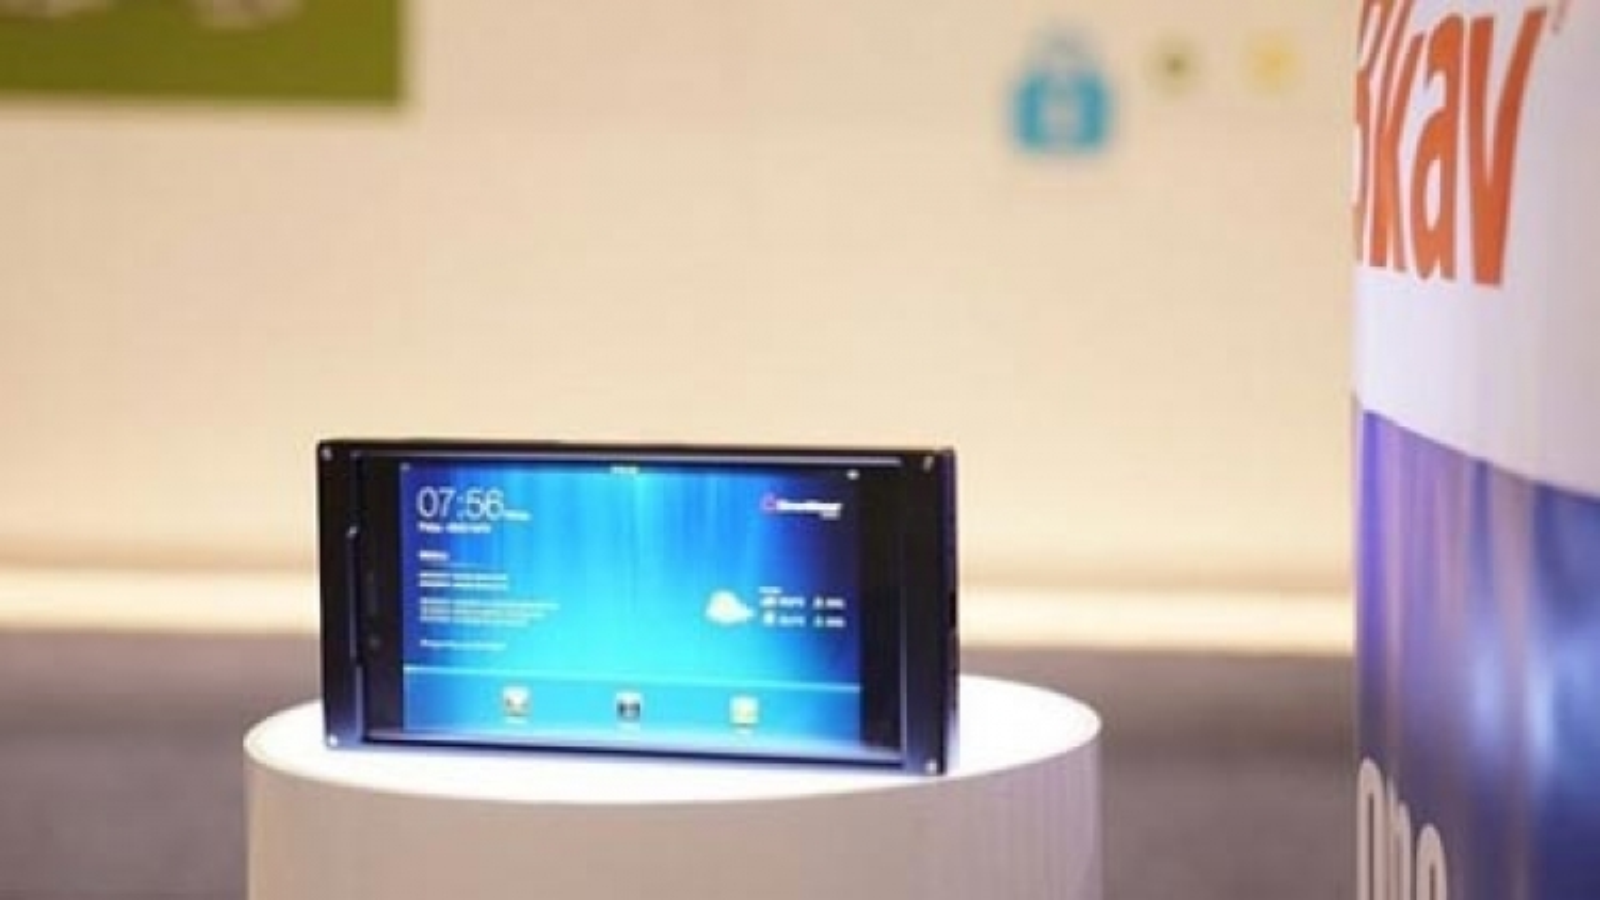 Bphone offers smartphone exchange